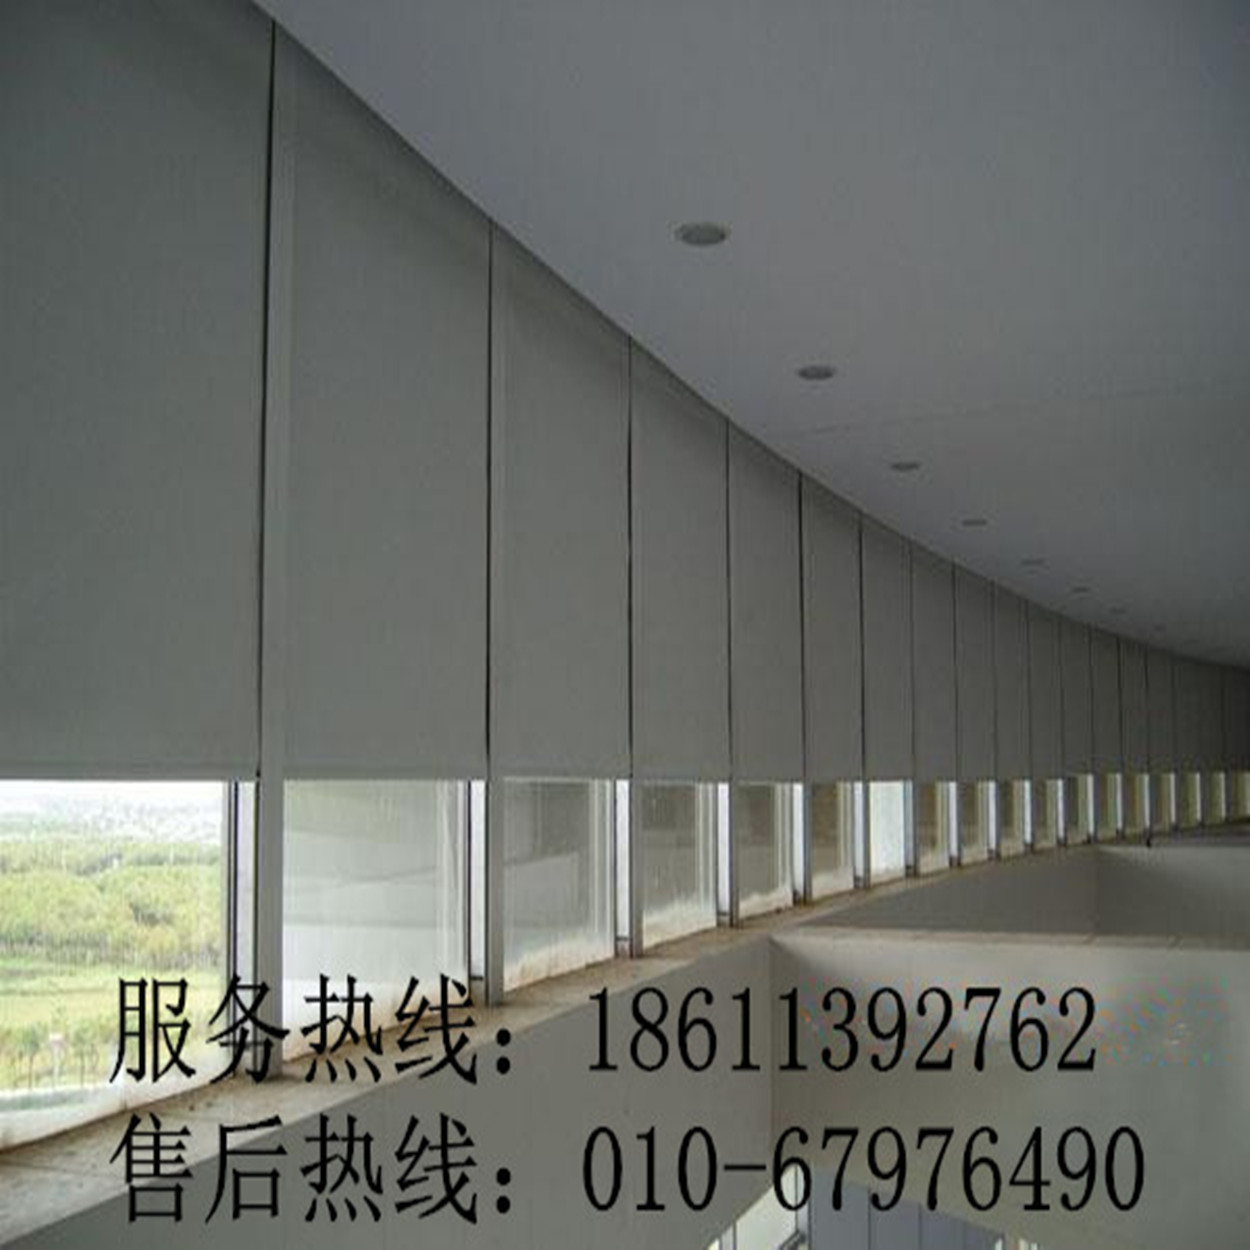 Waterproof Blackout Office Project Rolling Shutter Curtains